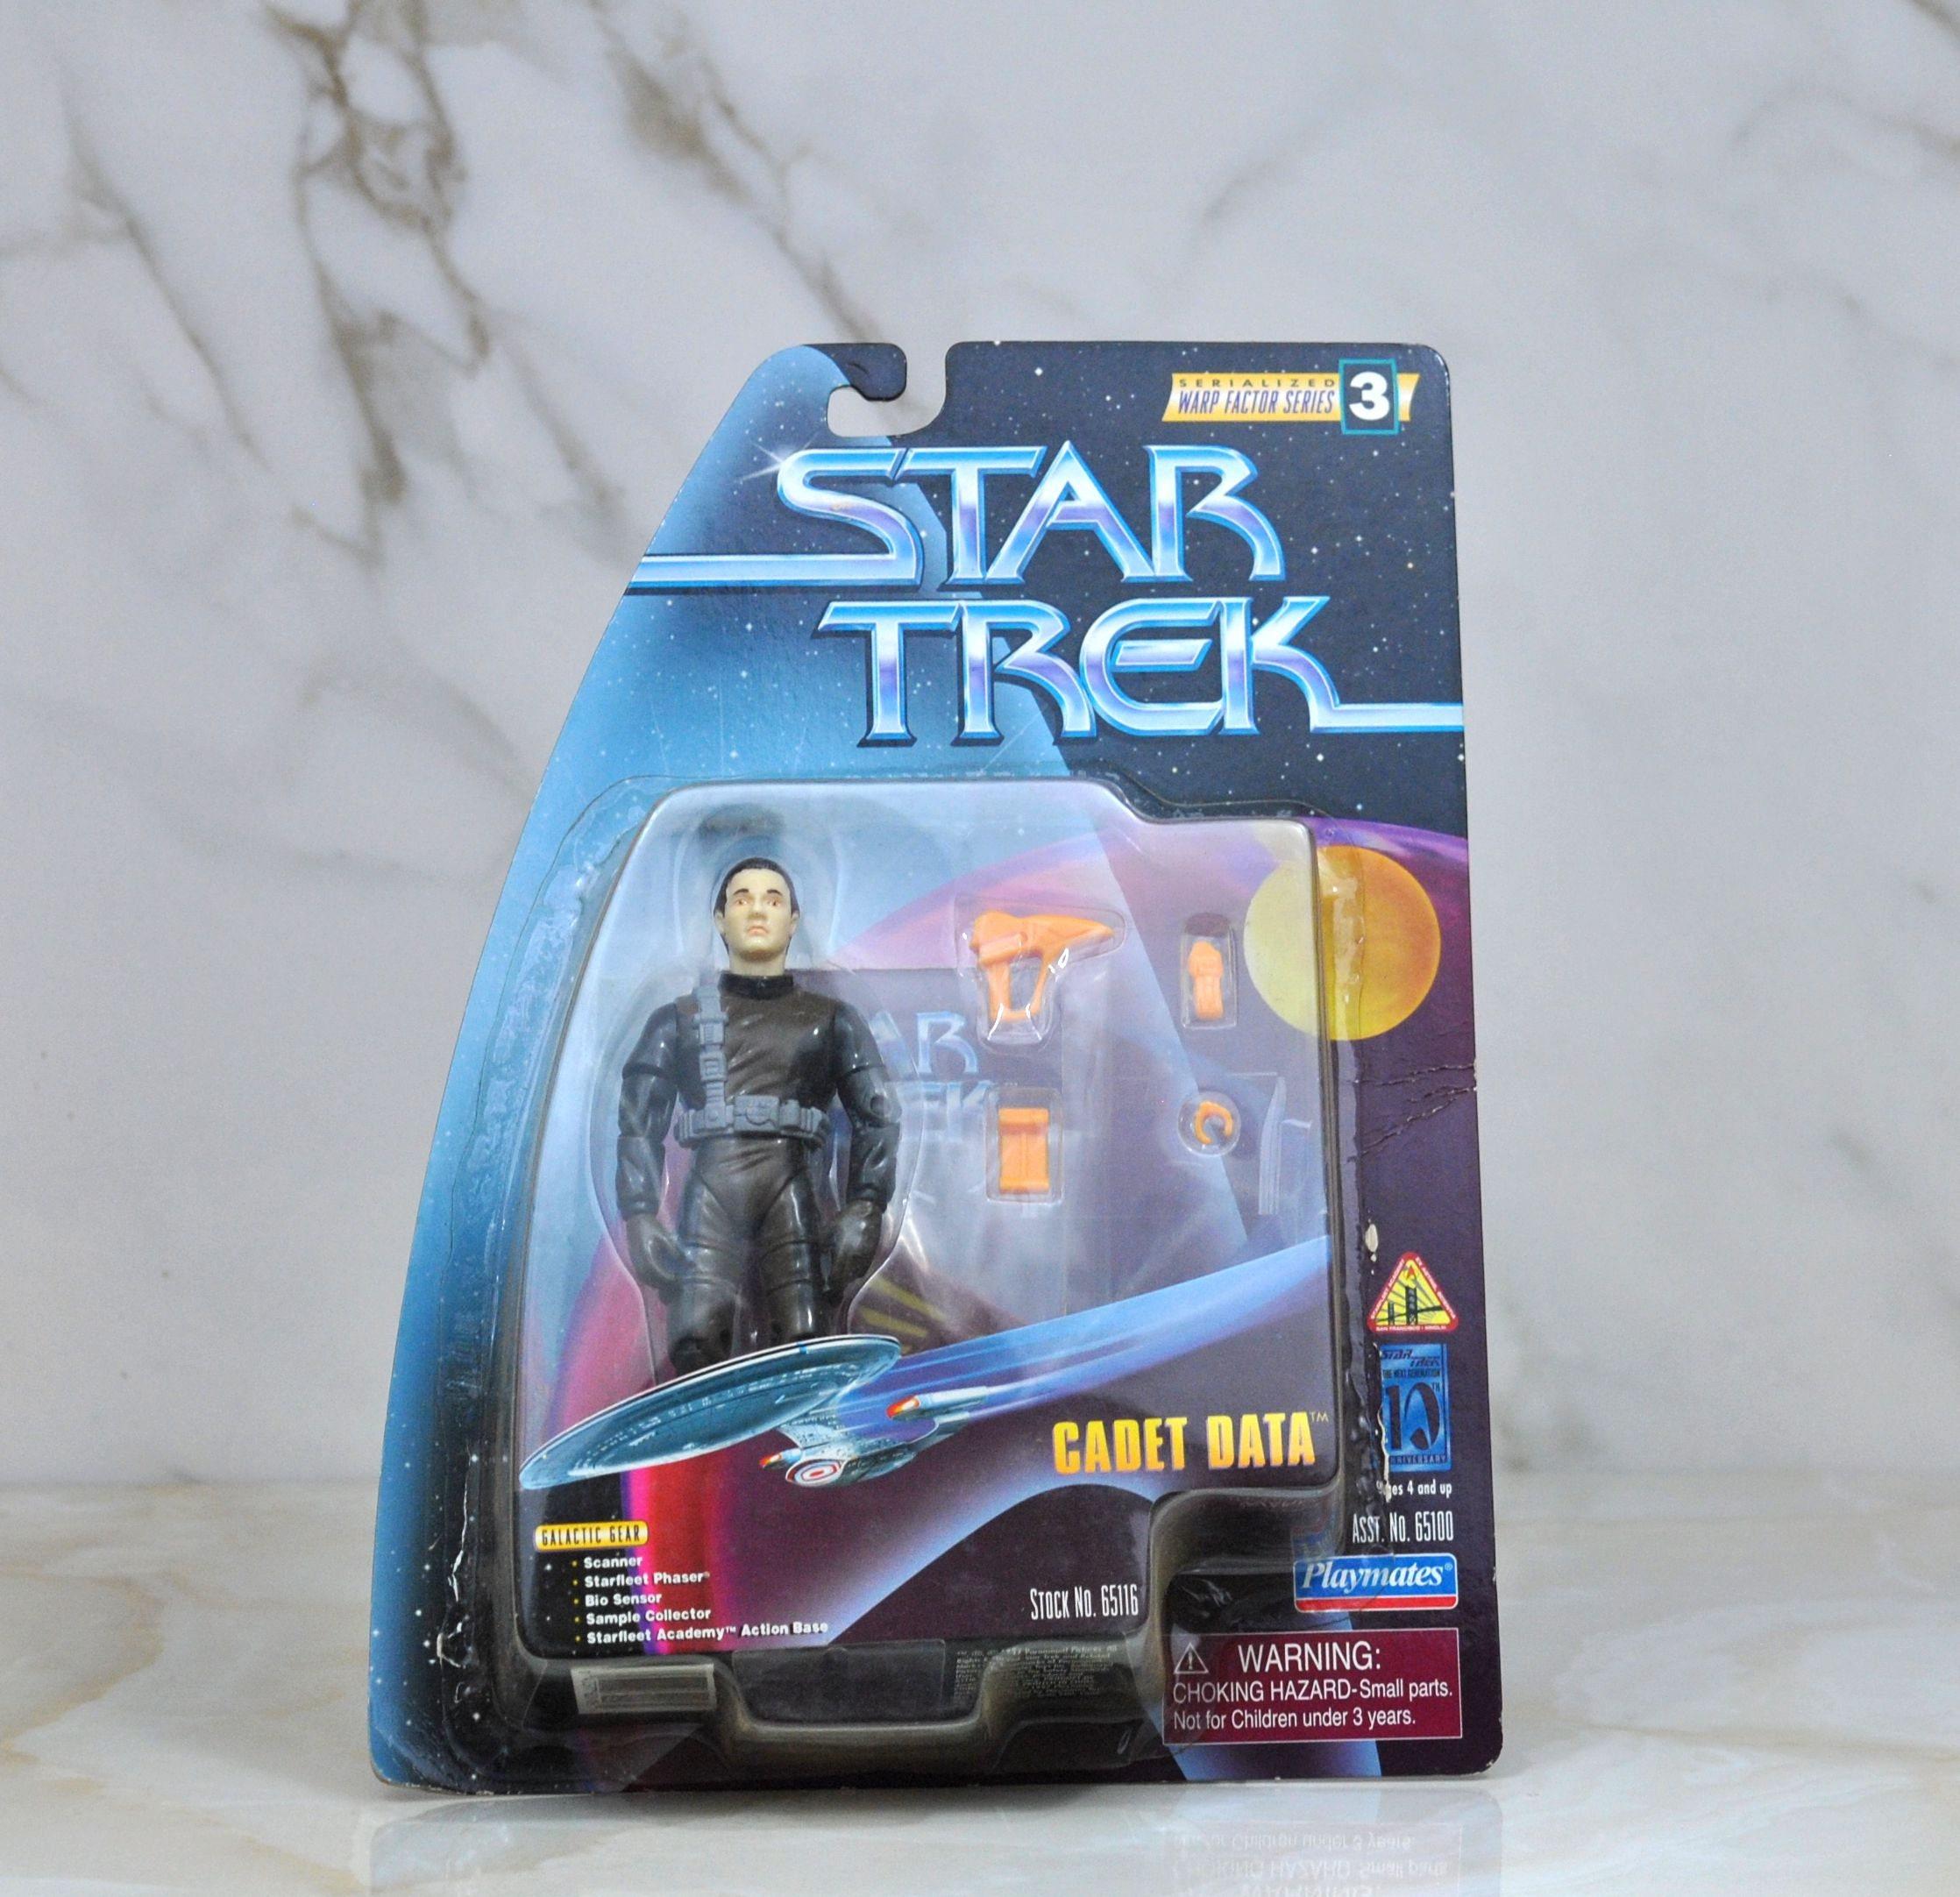 Vintage Star Trek Action Figure Cadet Data 65100 65116 1997